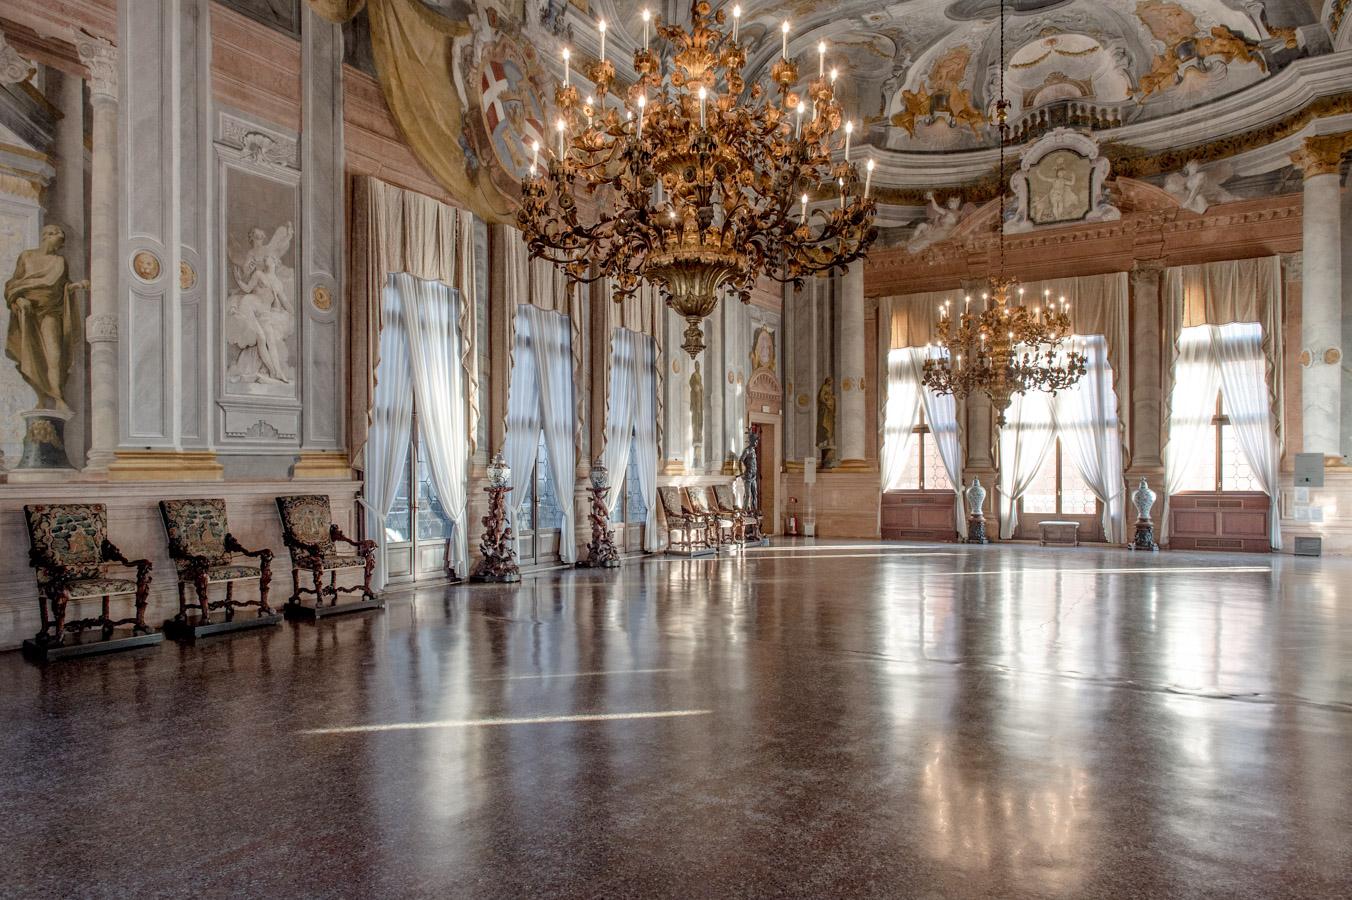 La salle de bal de Cà Rezzonico